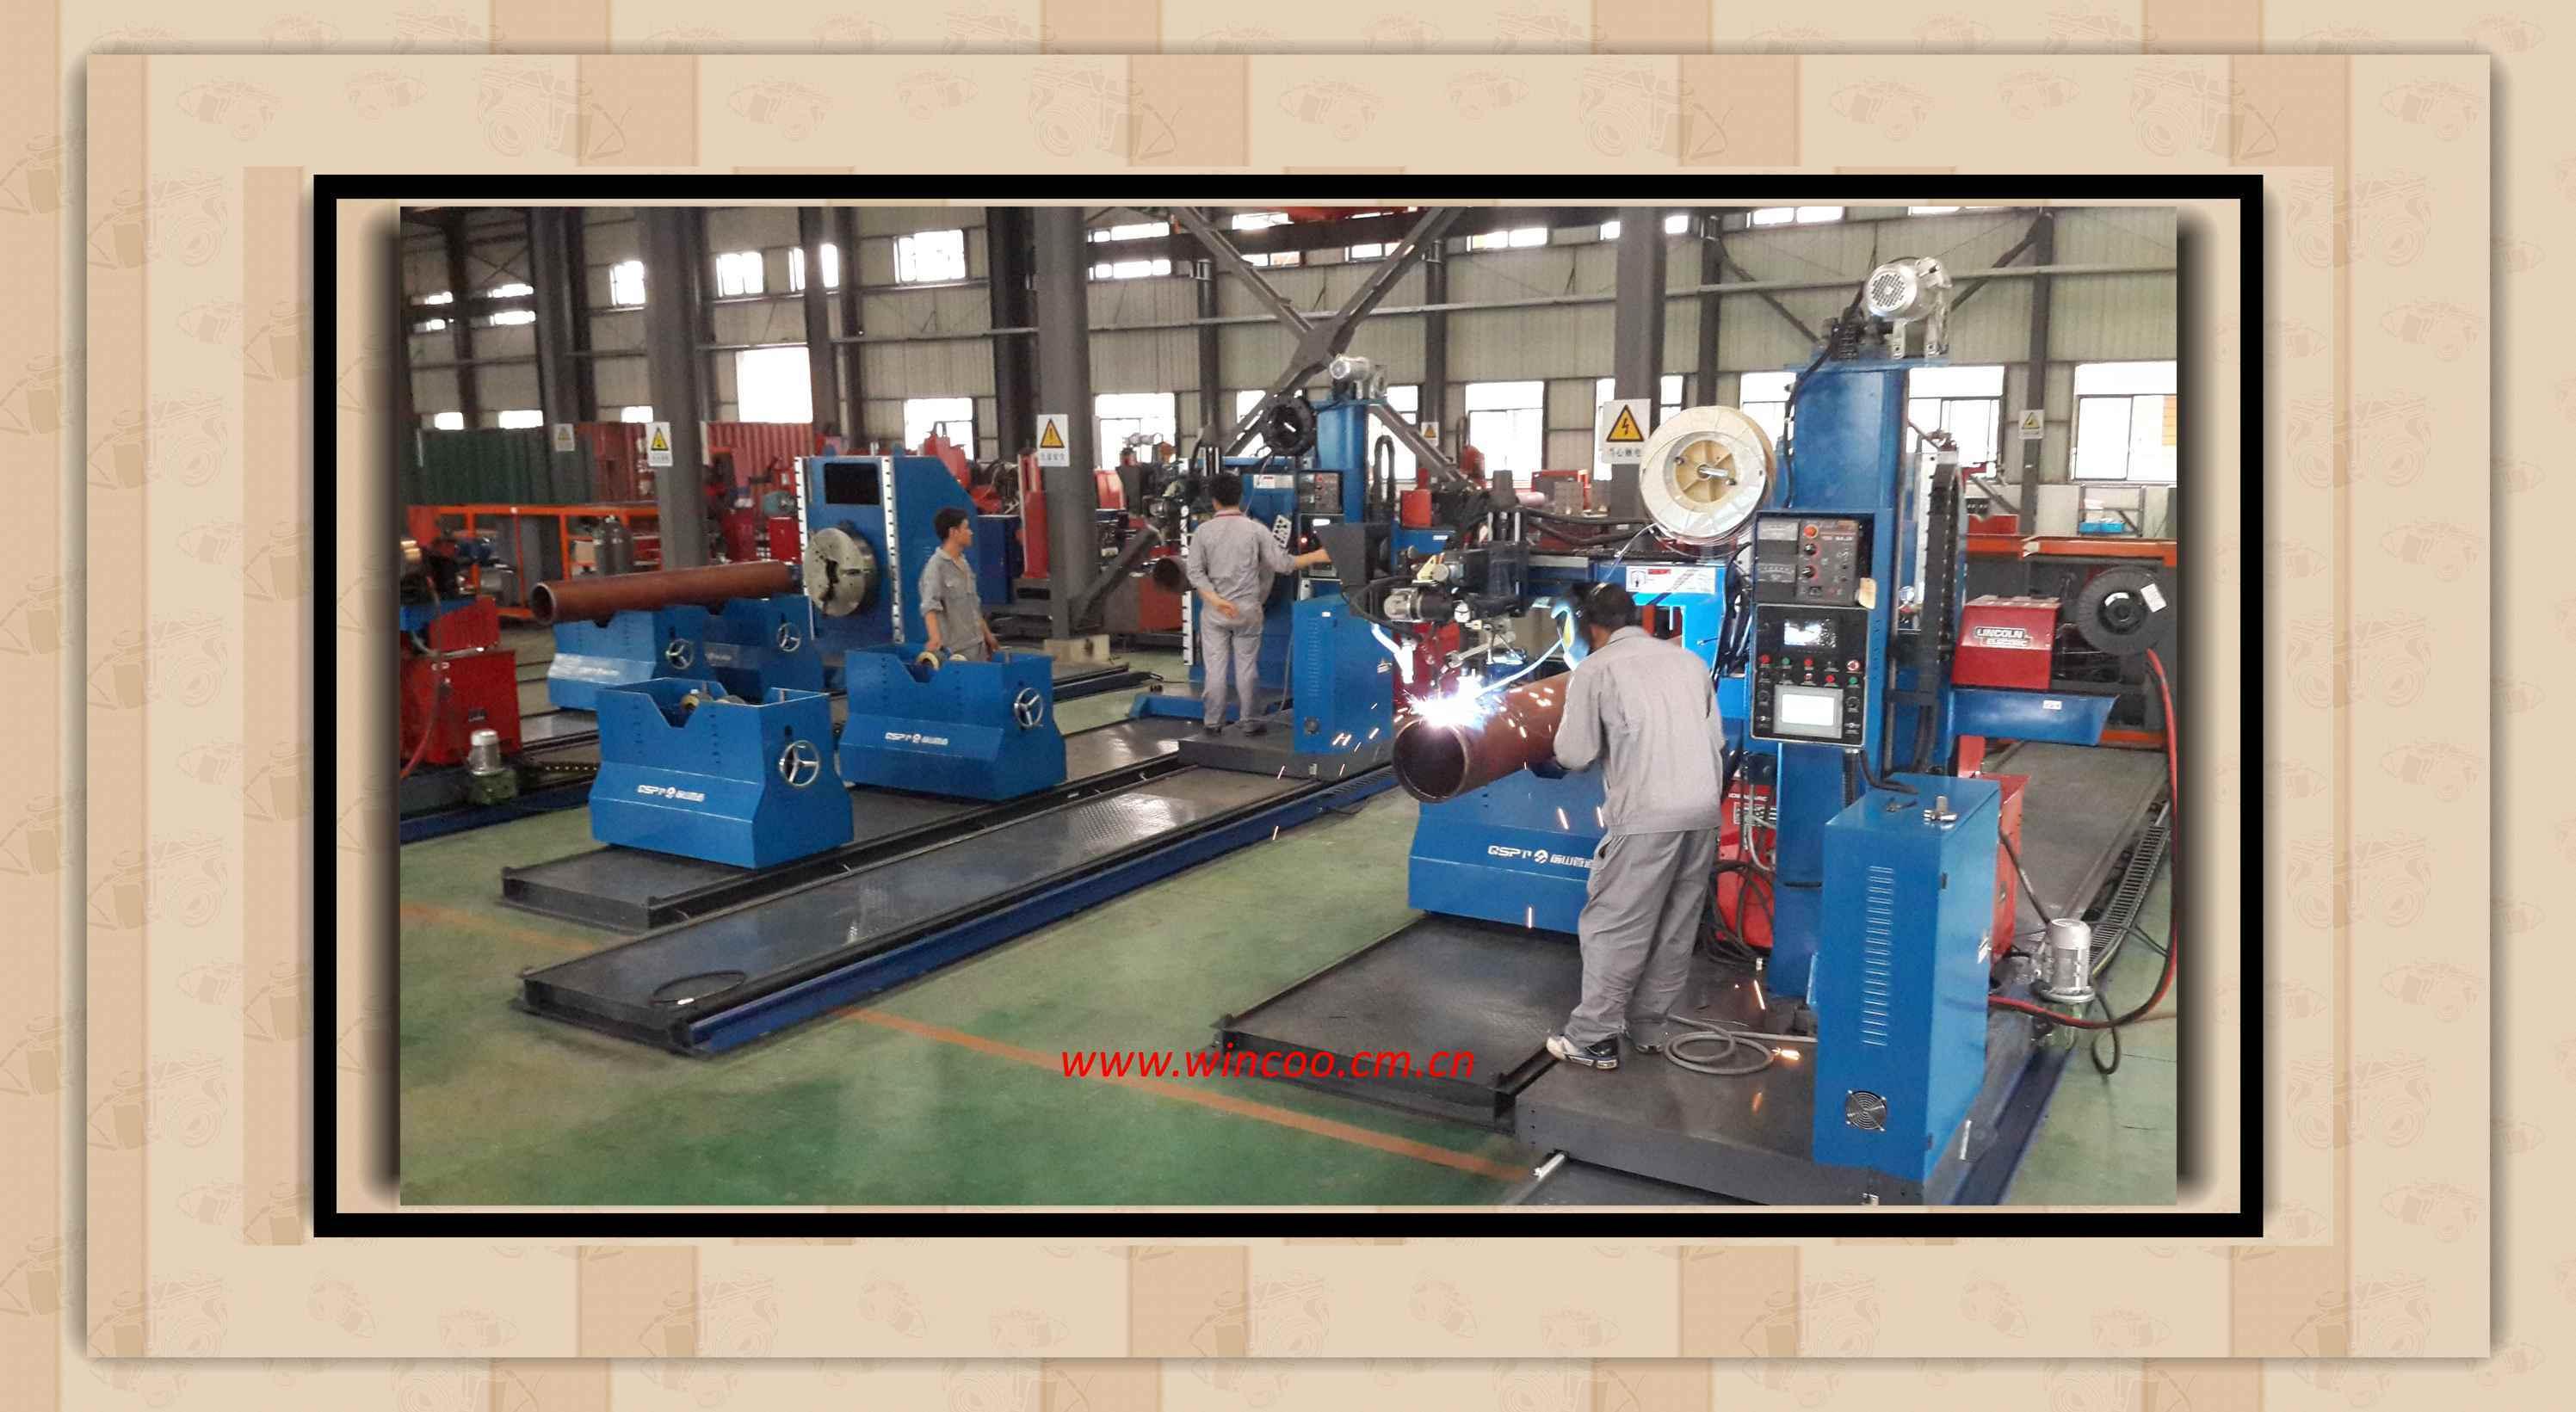 Pipe Spool Pipeline Fabrication Machines